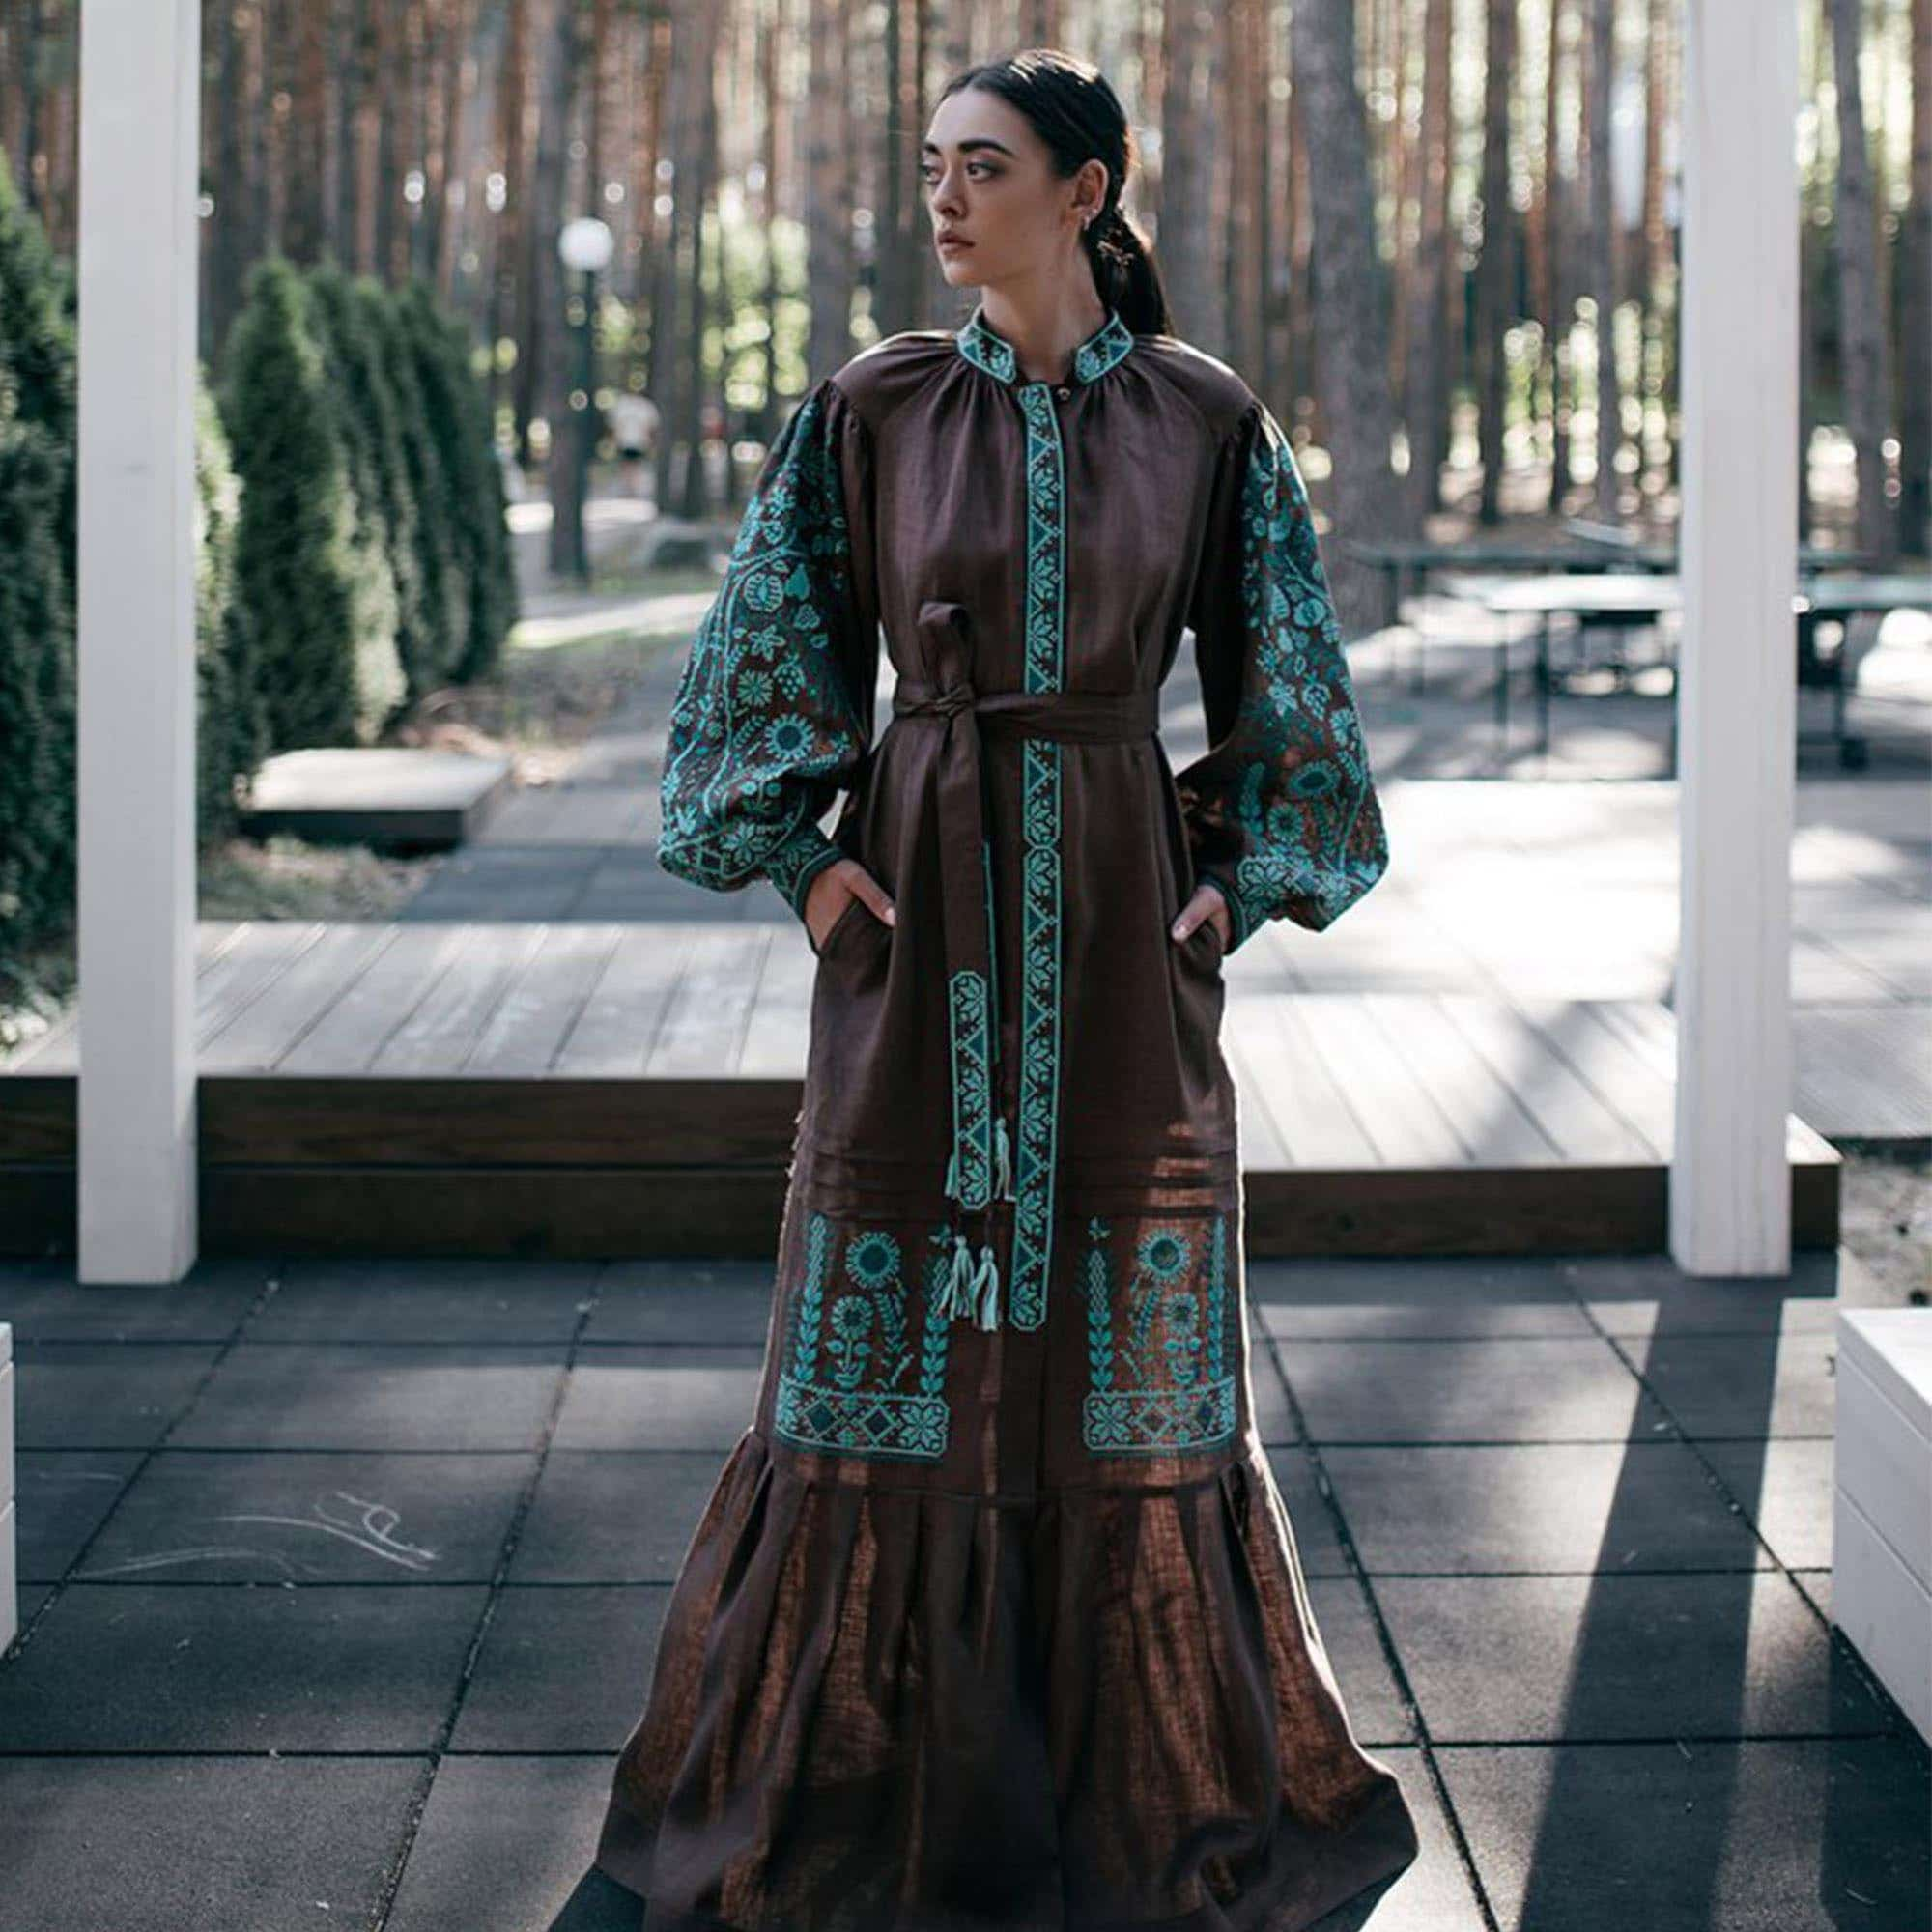 Dress with a symbol of beregin